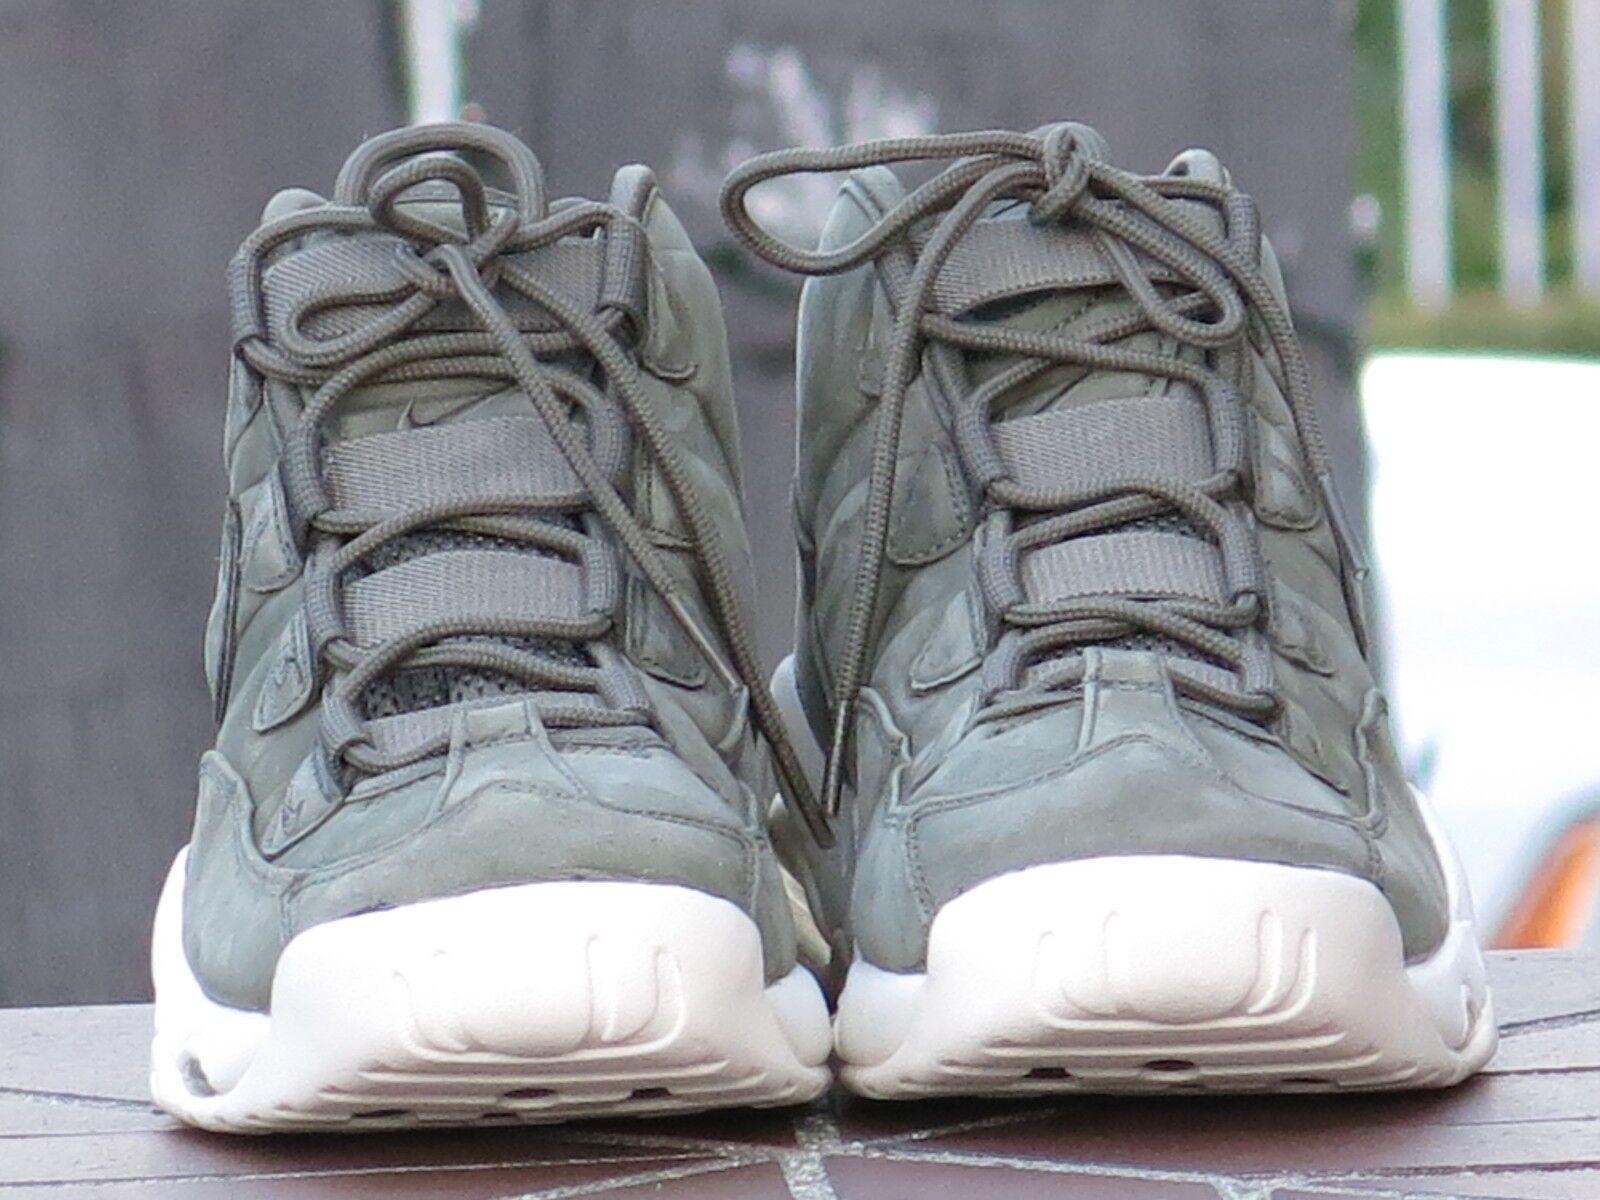 Nike Air Max Uptempo Uptempo Uptempo Men's Basketball Sneakers 311090-301 05f6a8